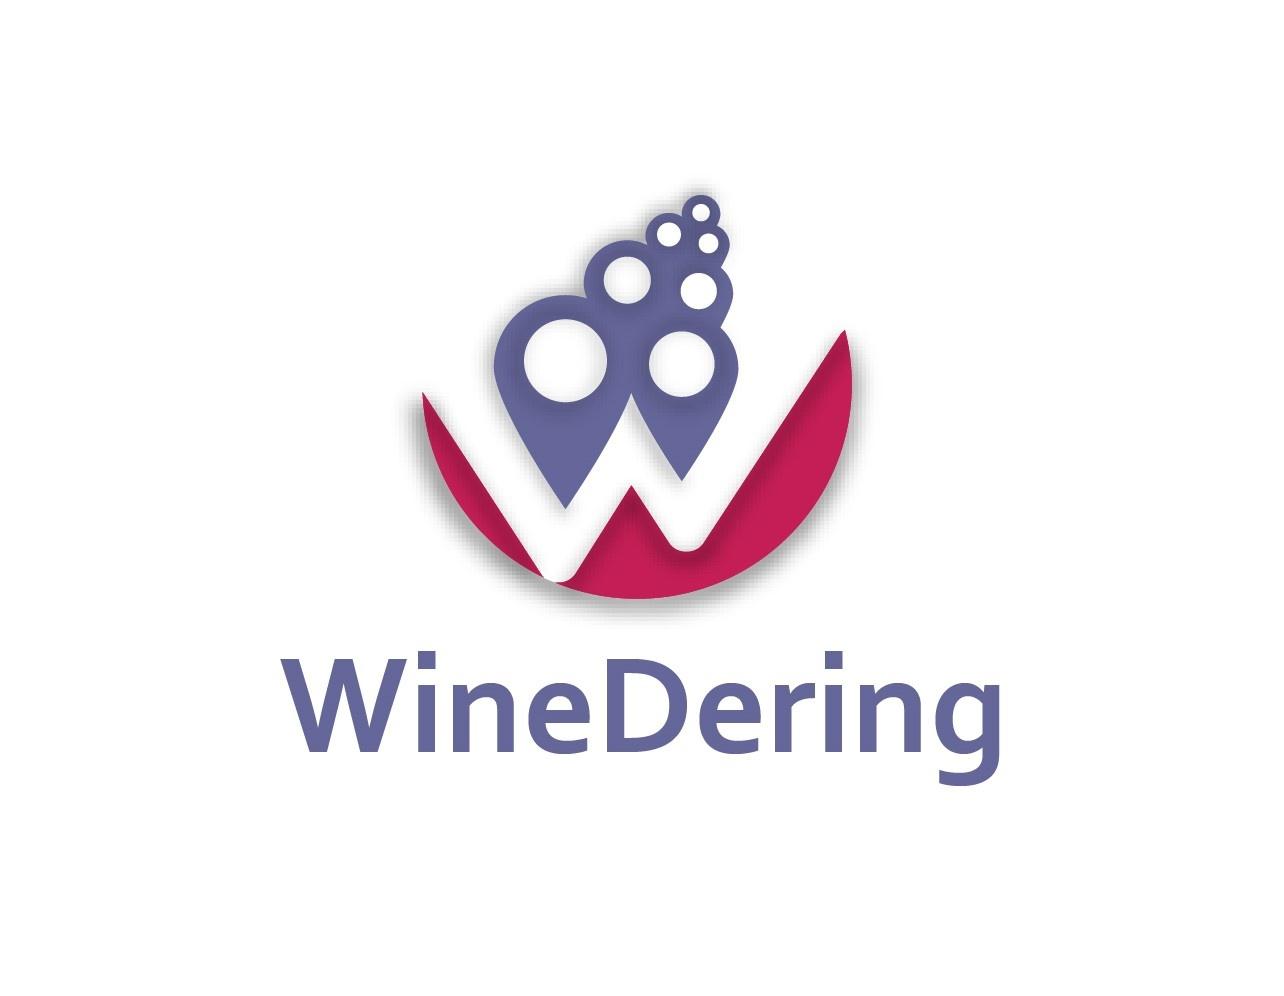 Winedering